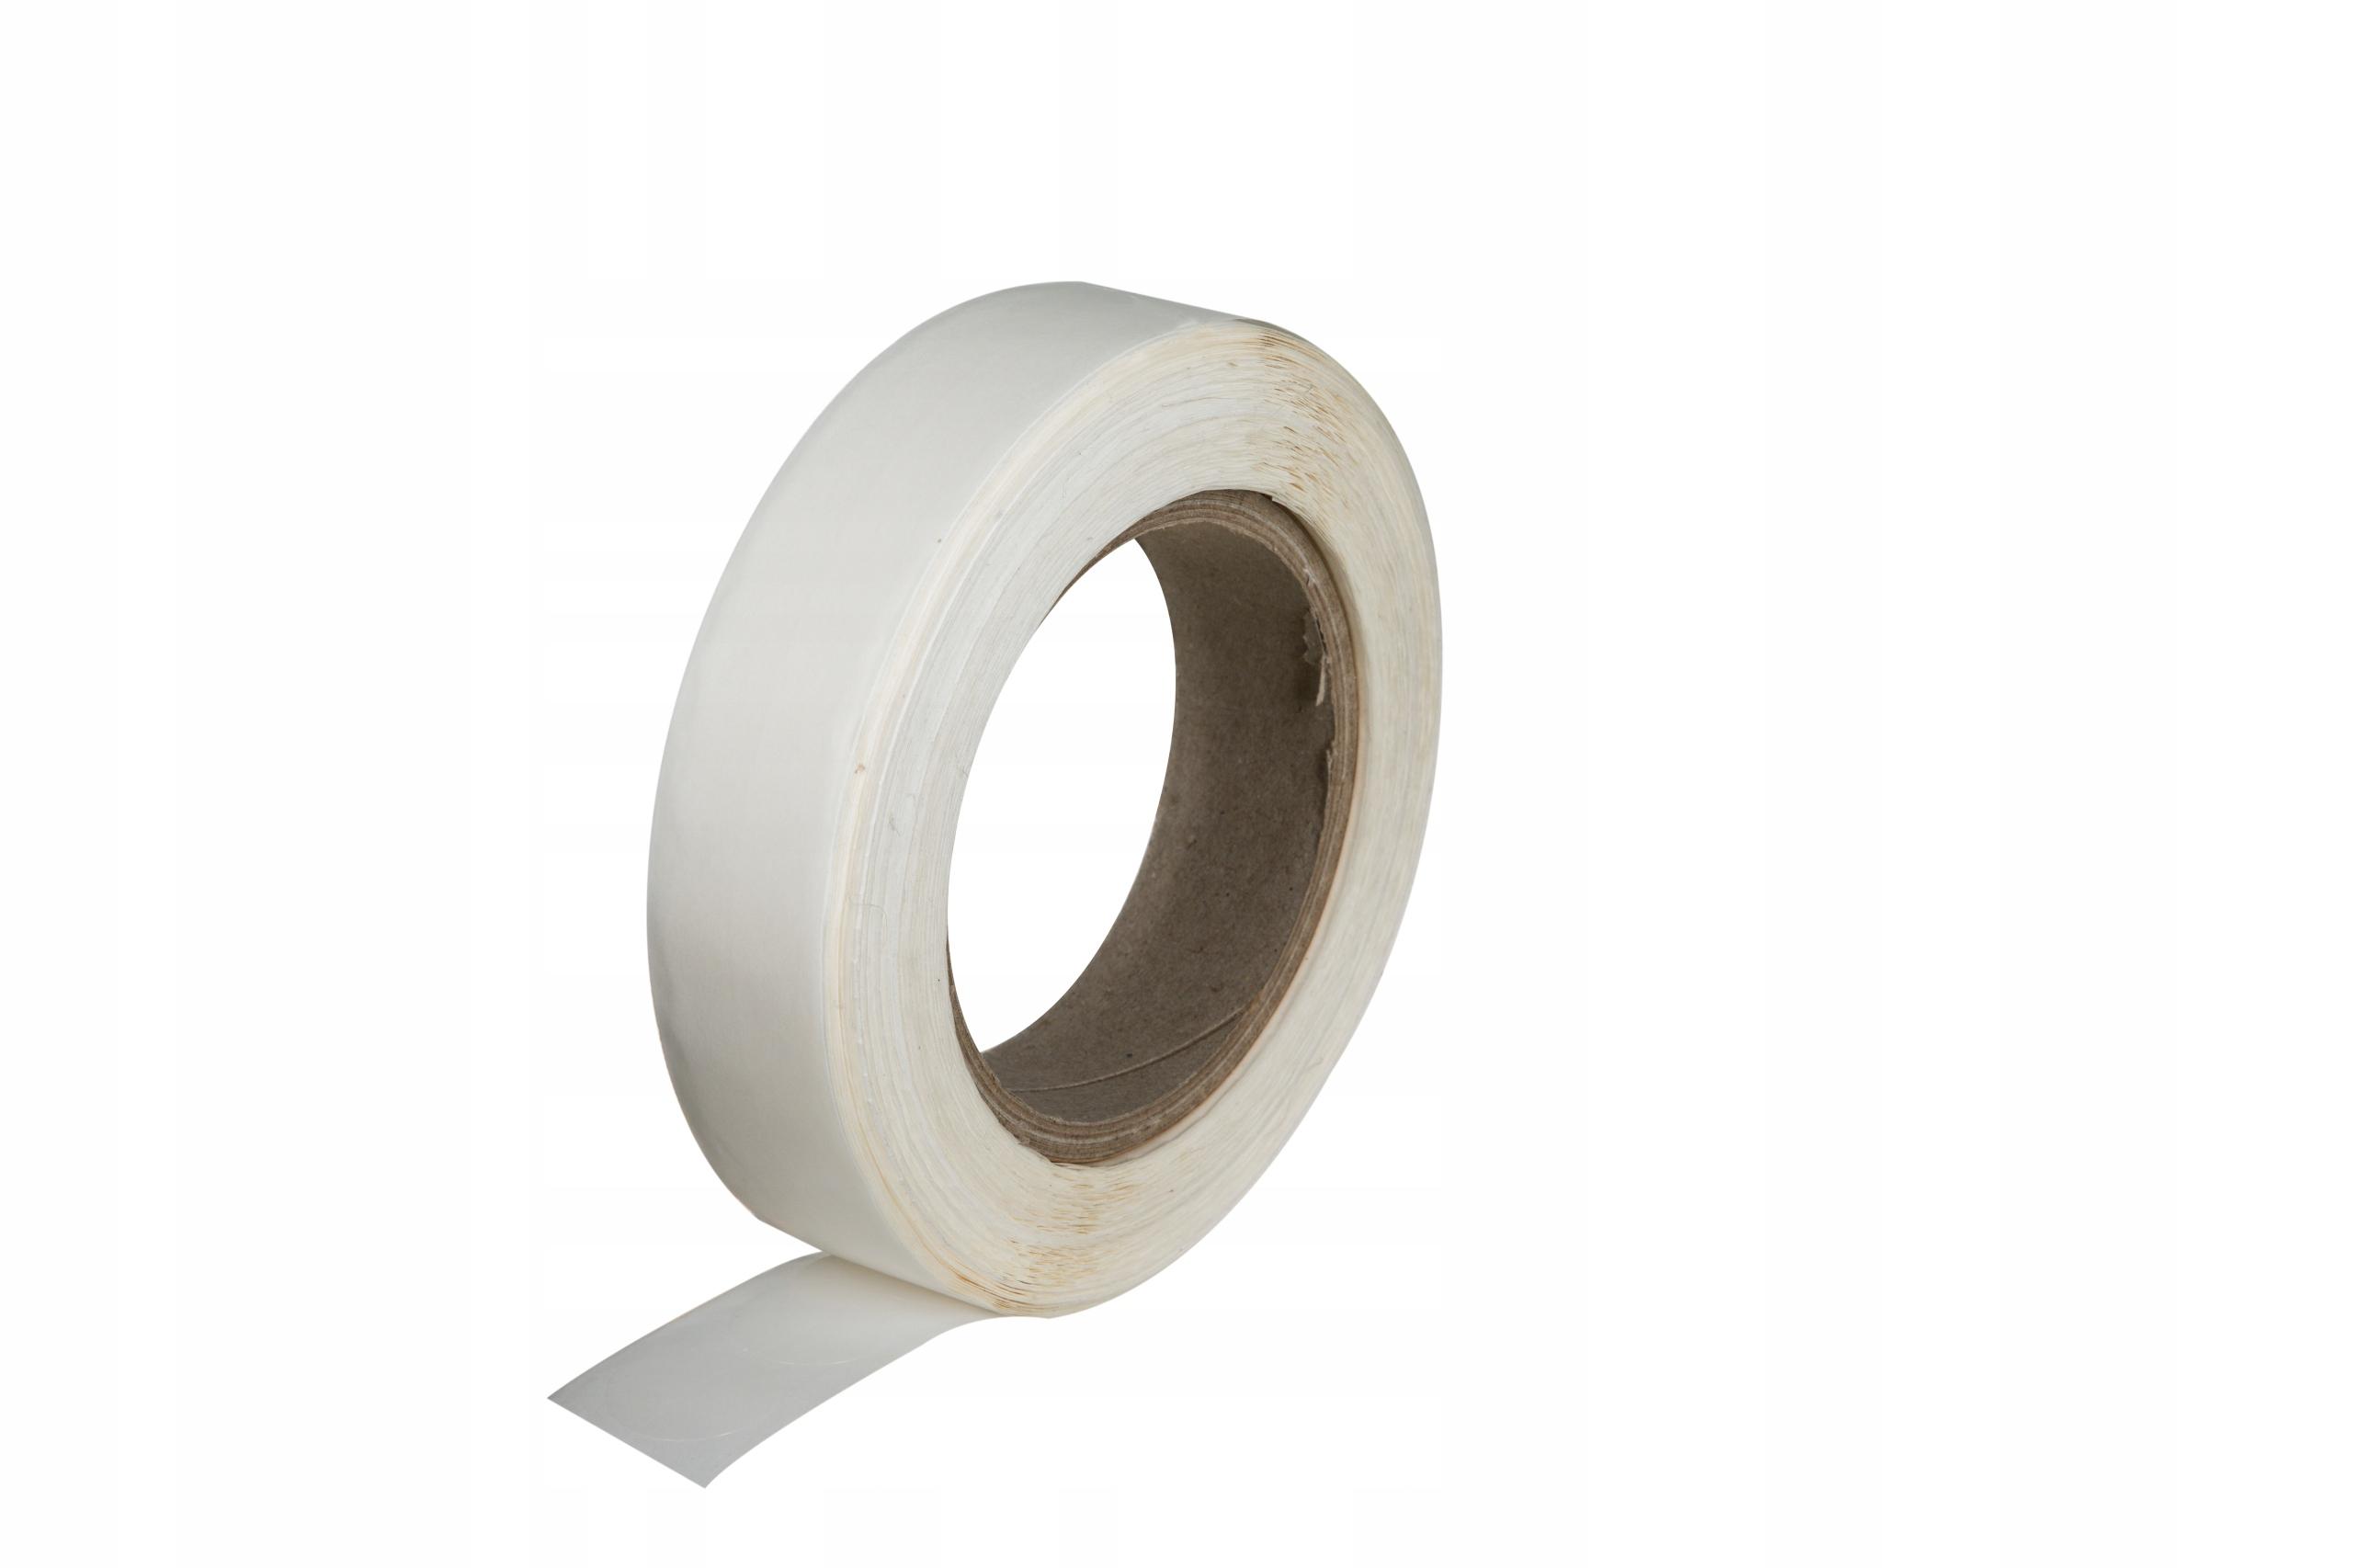 Sľučidlo Jednostranné lepidlo 30 mm